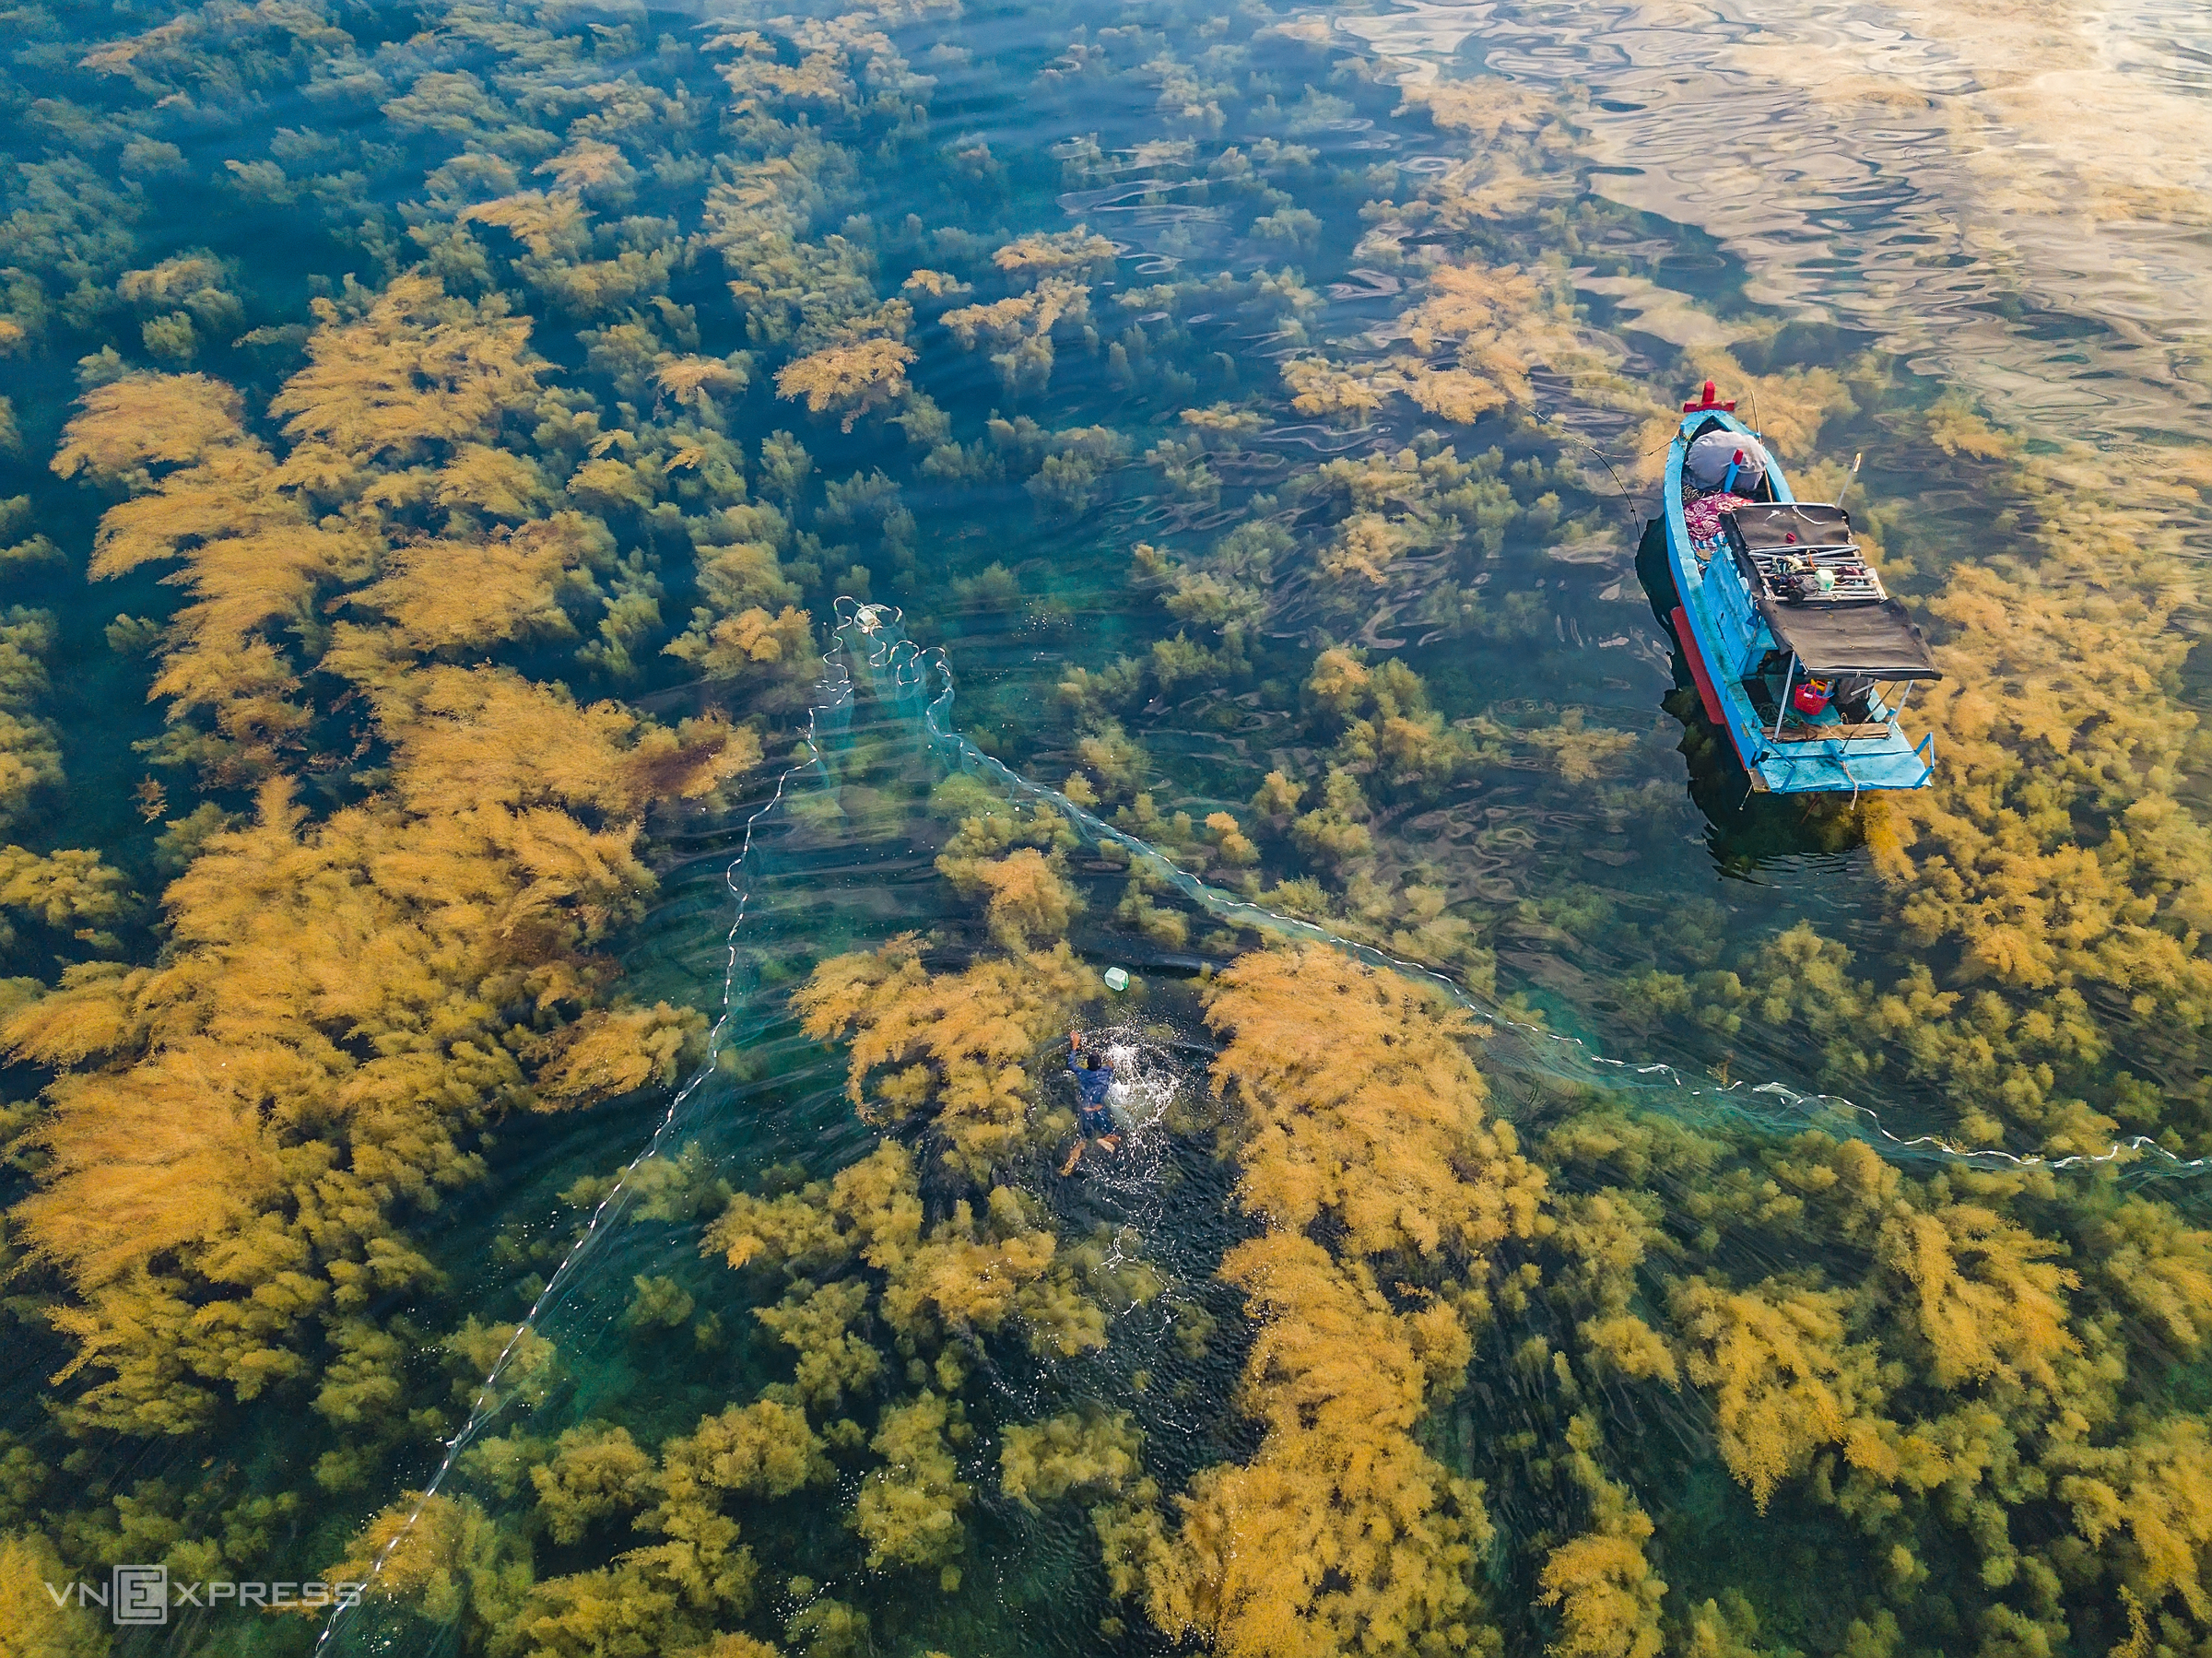 Seafood, seaweed nourish fisherfolk off Quang Ngai coast